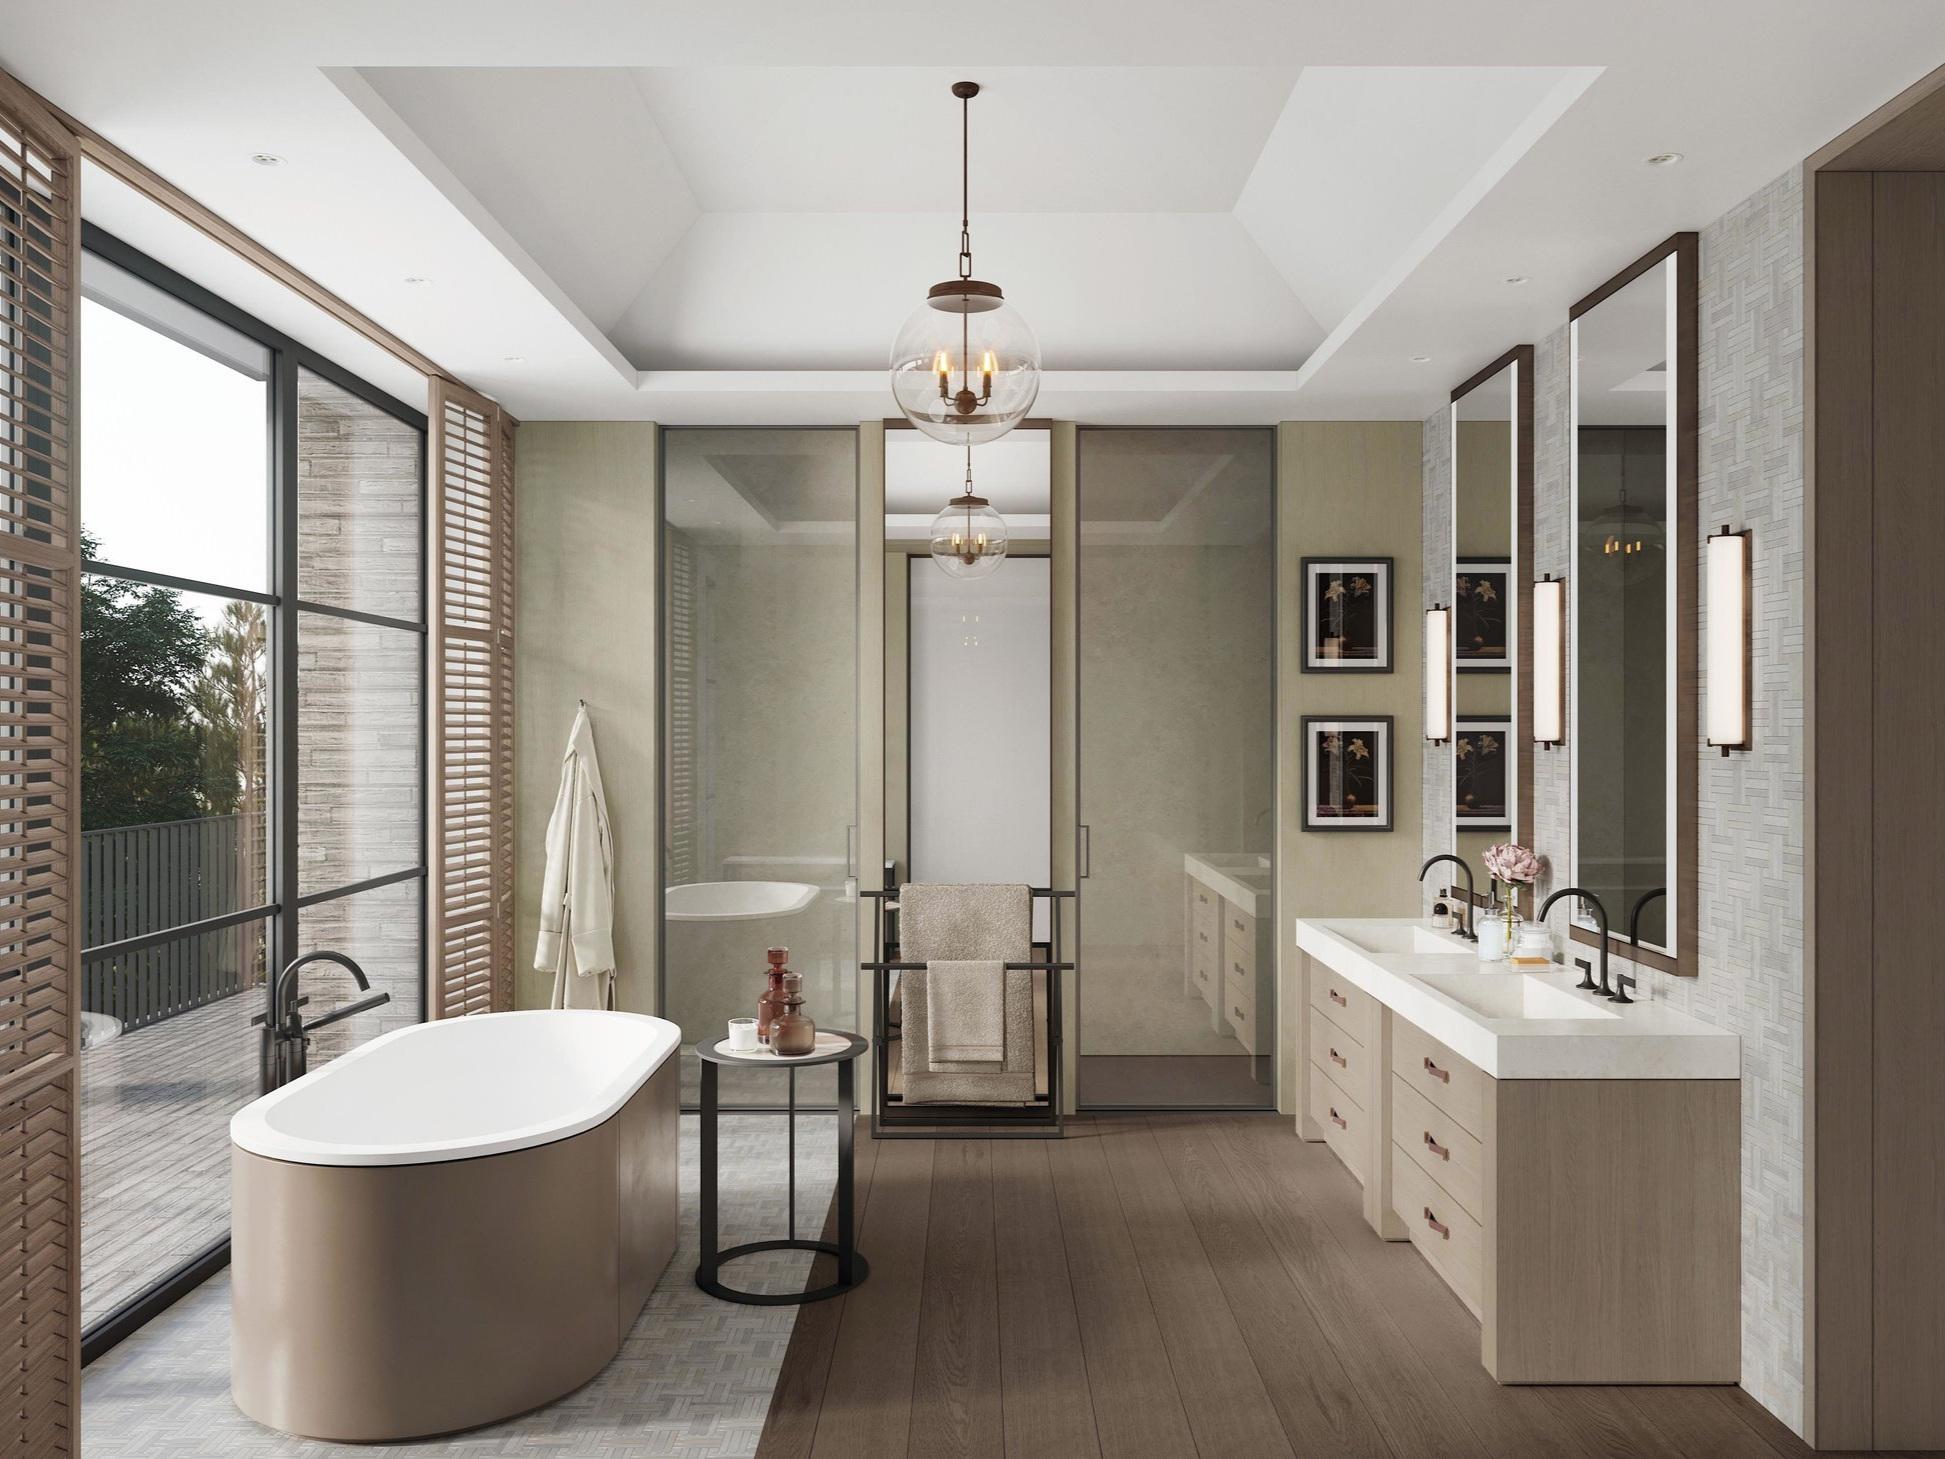 MVOK_PR2_Master Bathroom_HR_small.jpg